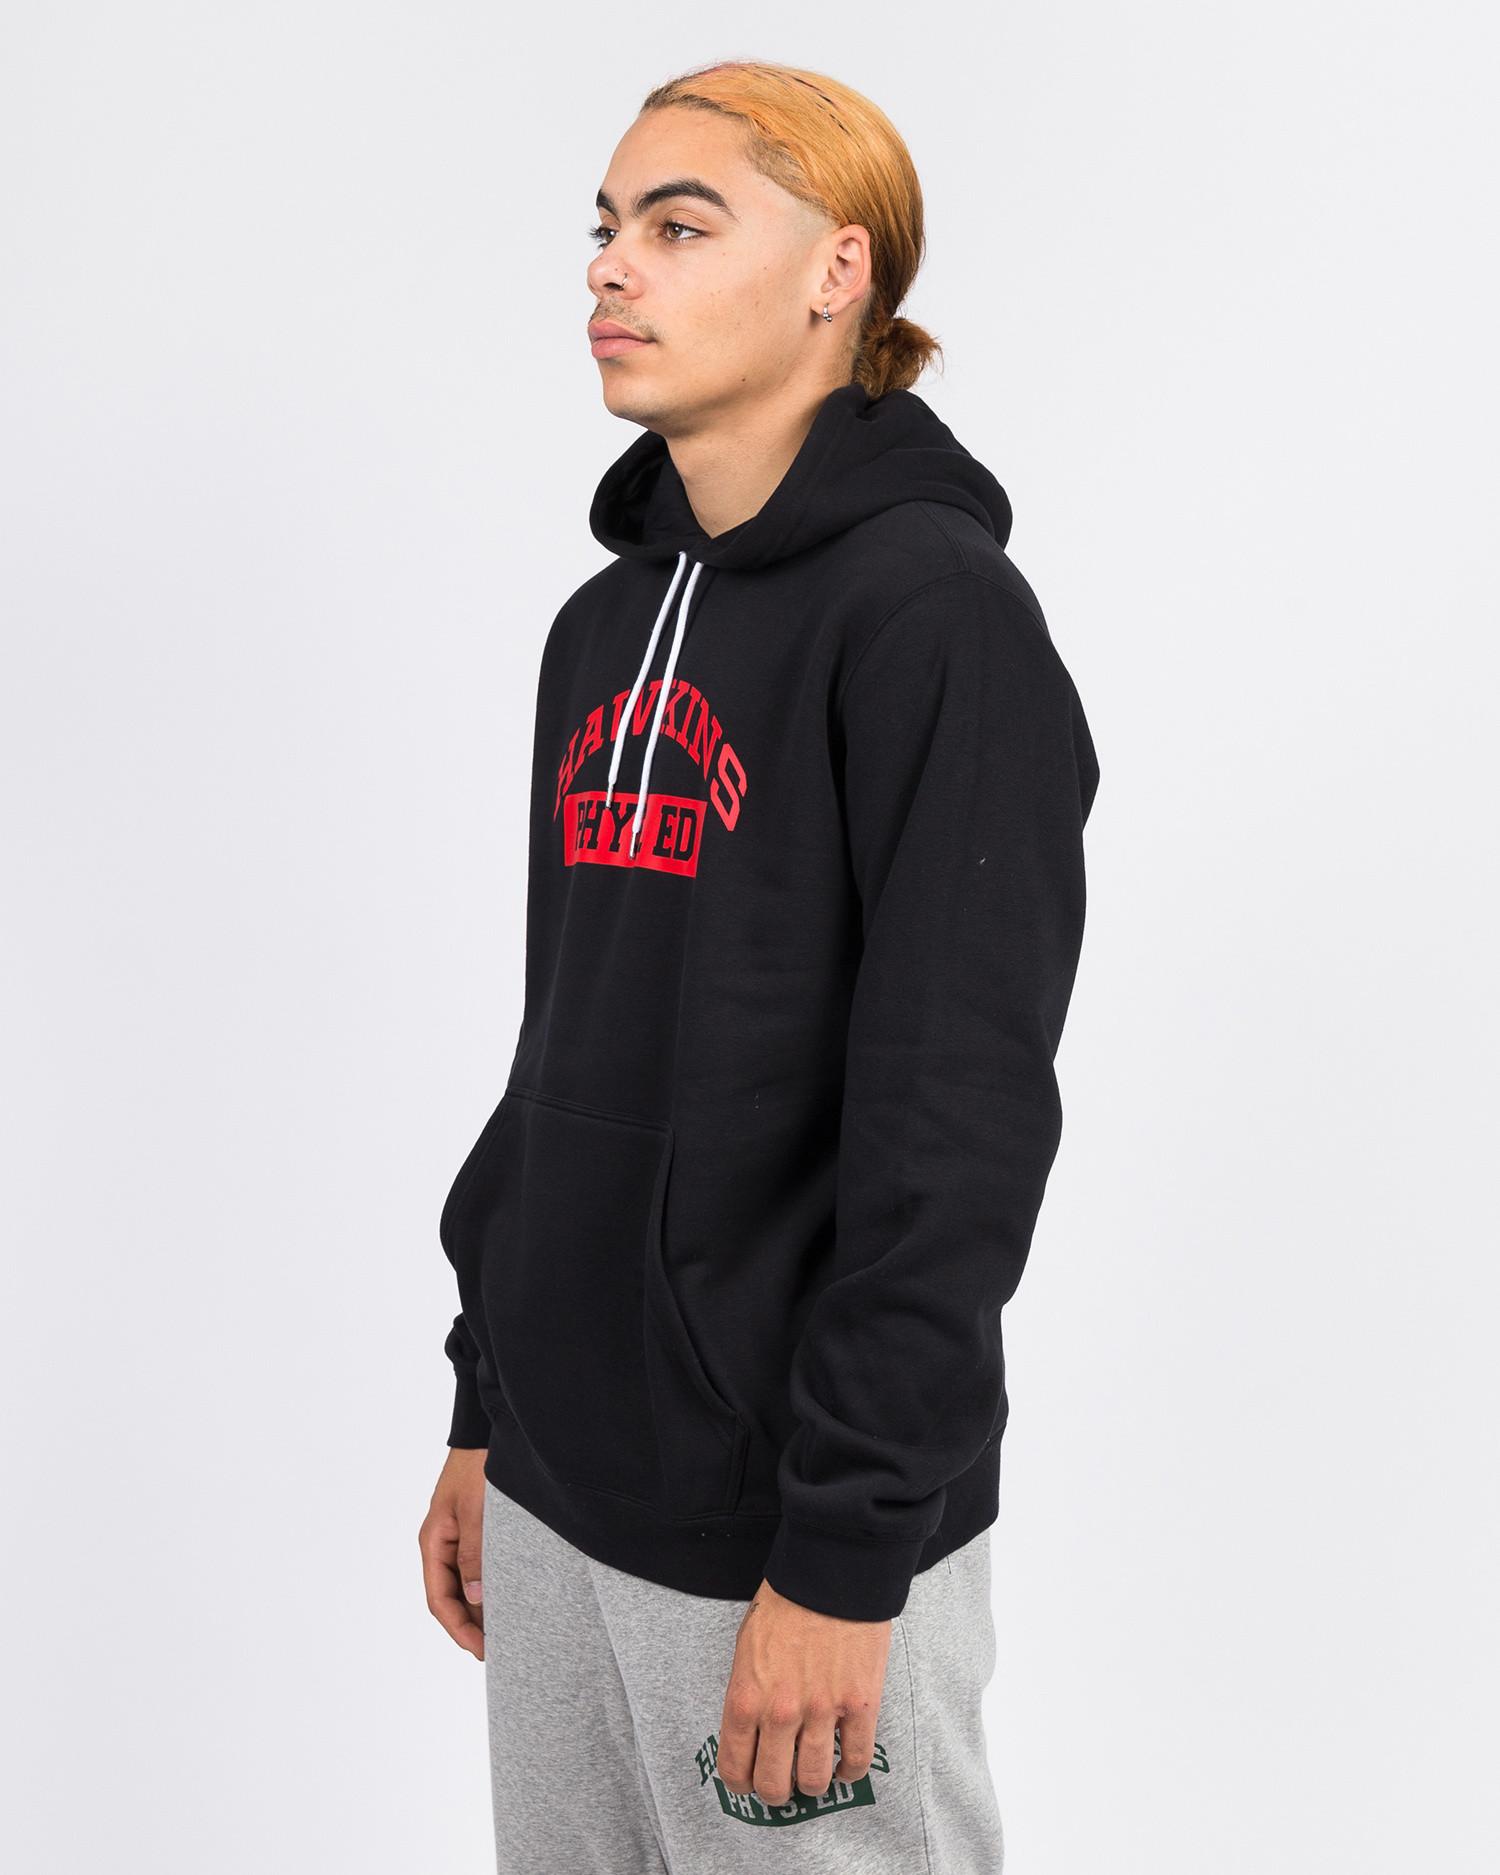 Nike Stranger Things Club Hoodie po bb s.t. Black/white/university red